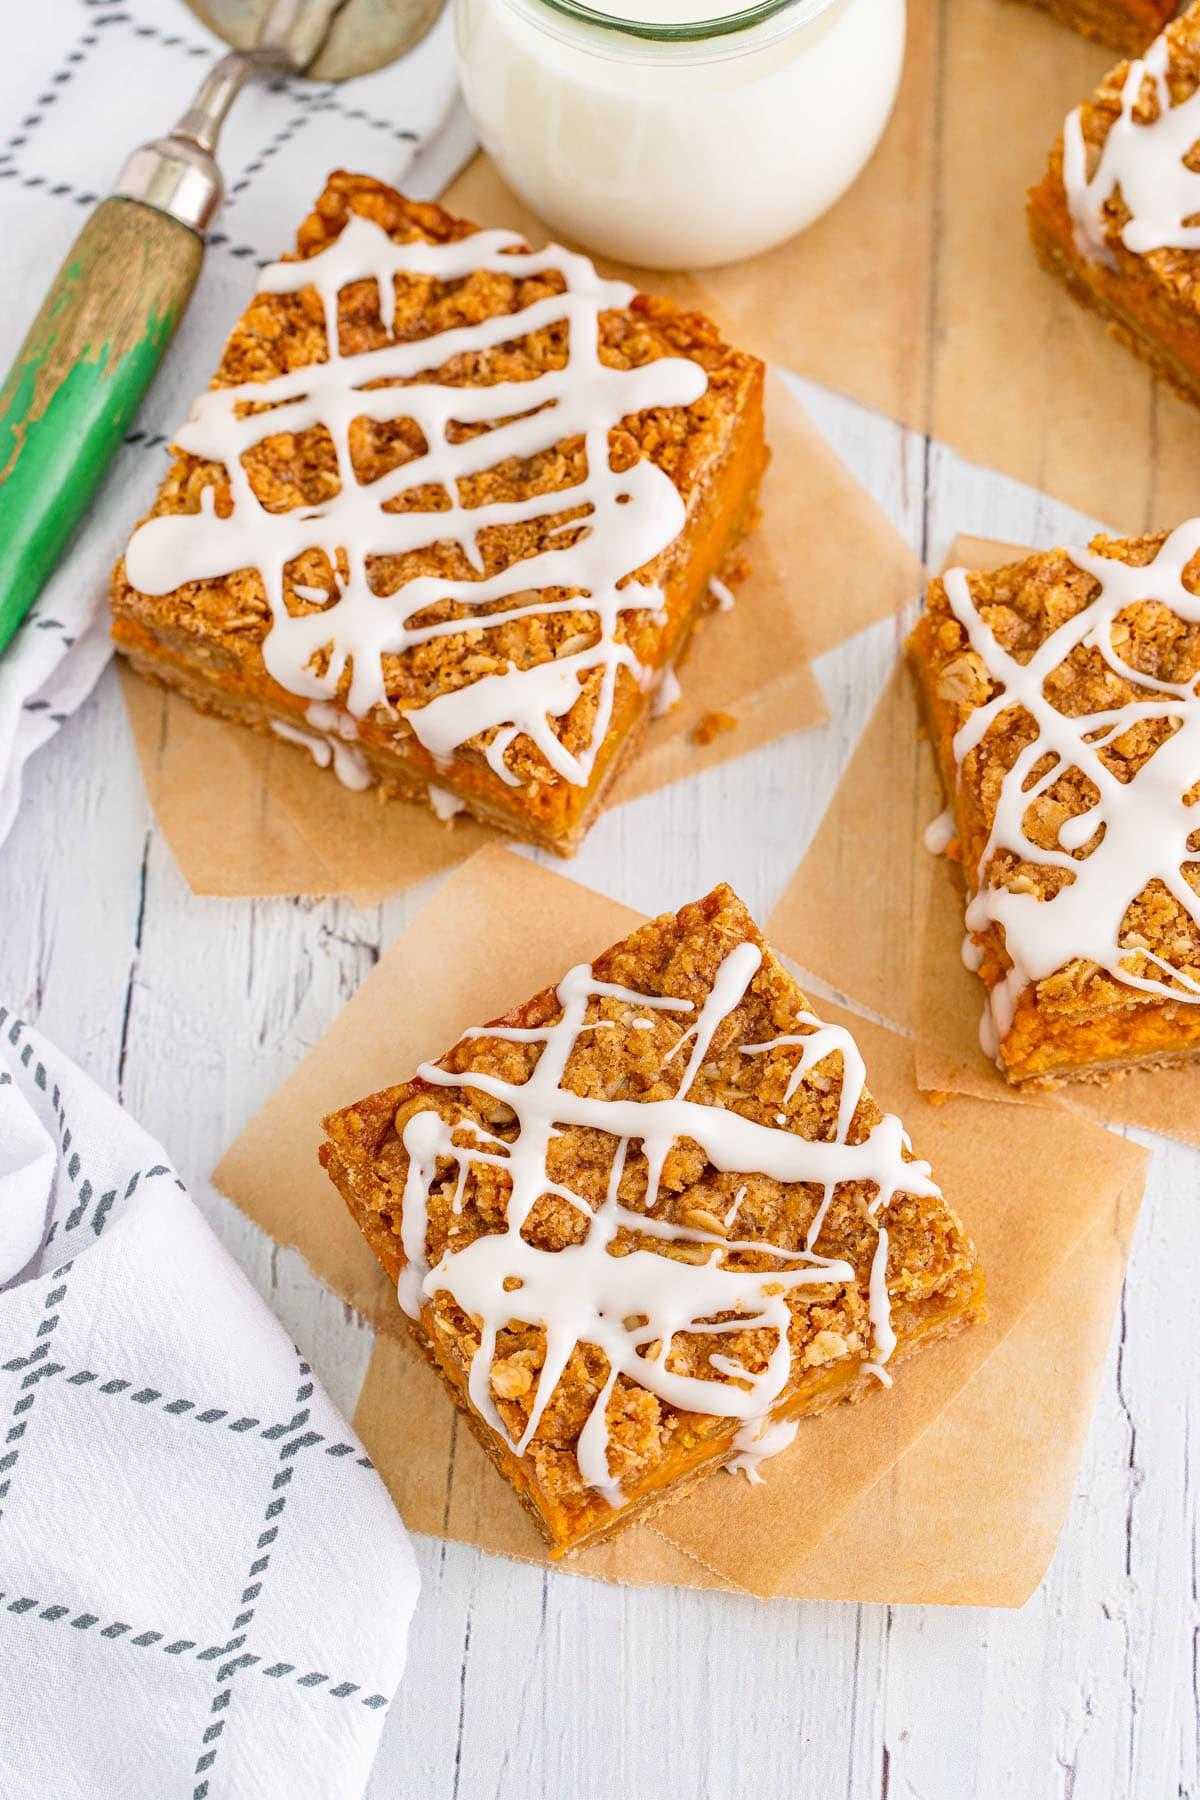 pumpkin streusel bars with glaze on top